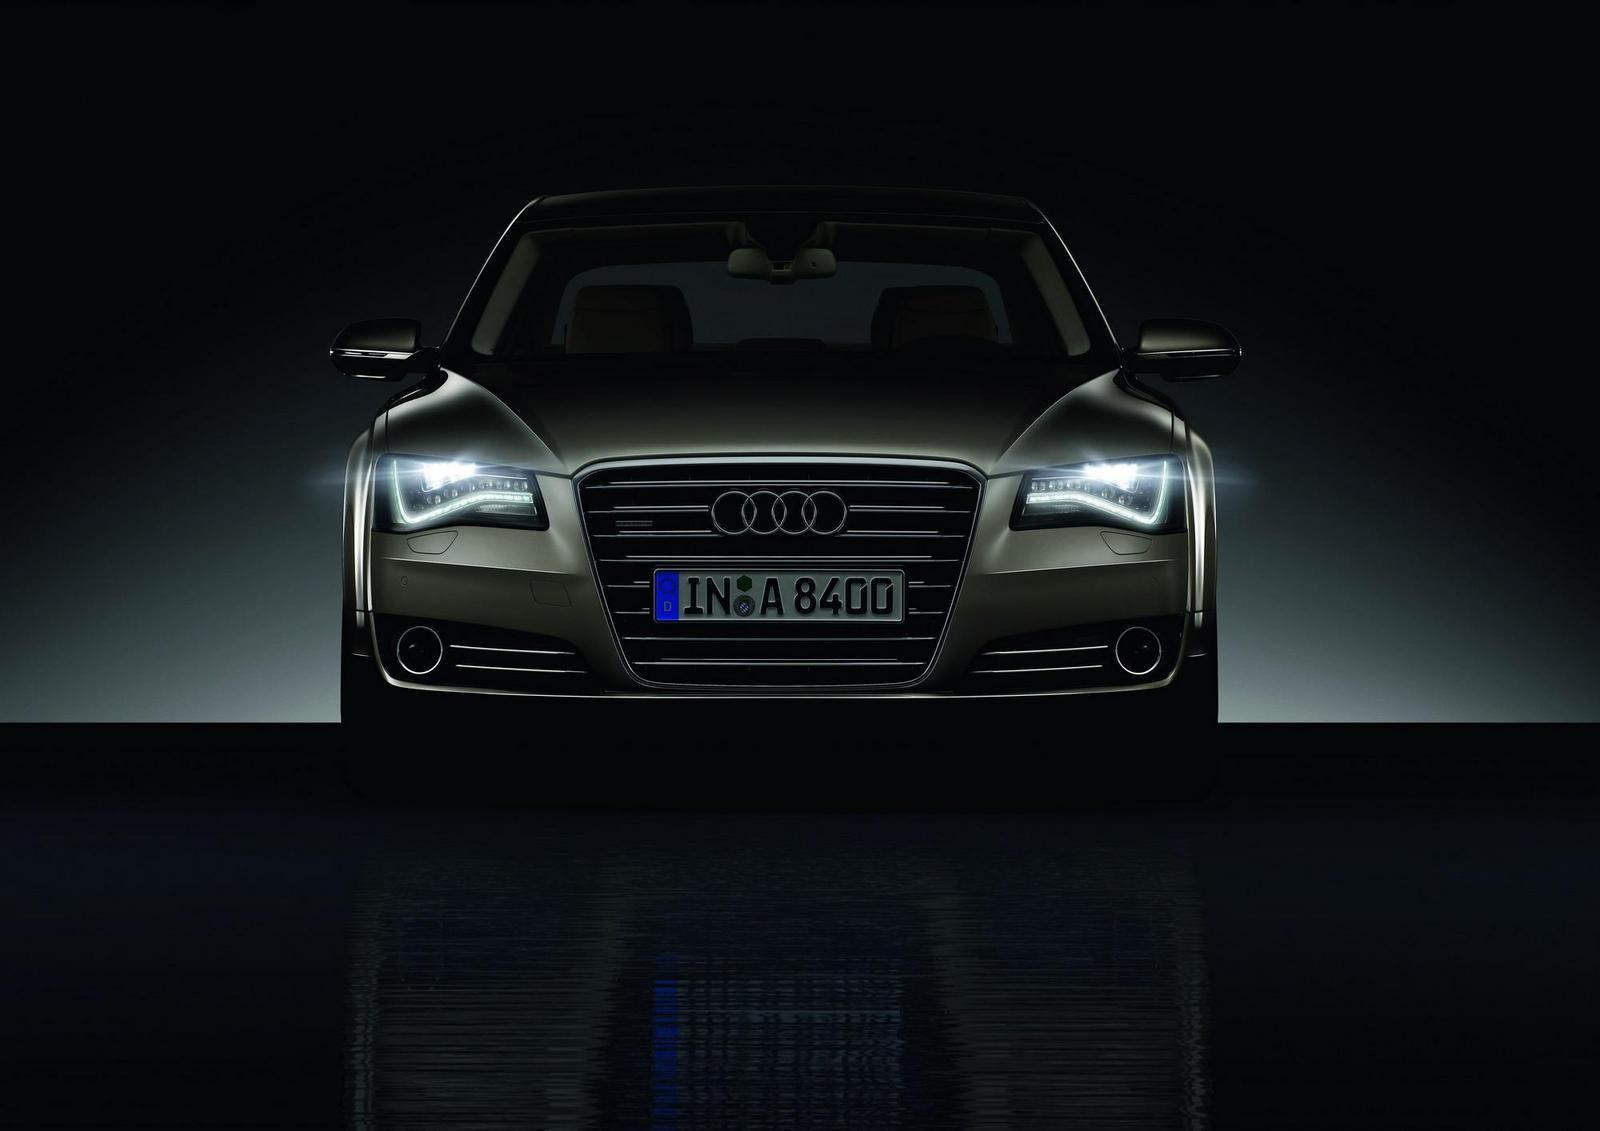 The Audi A8 hybrid,